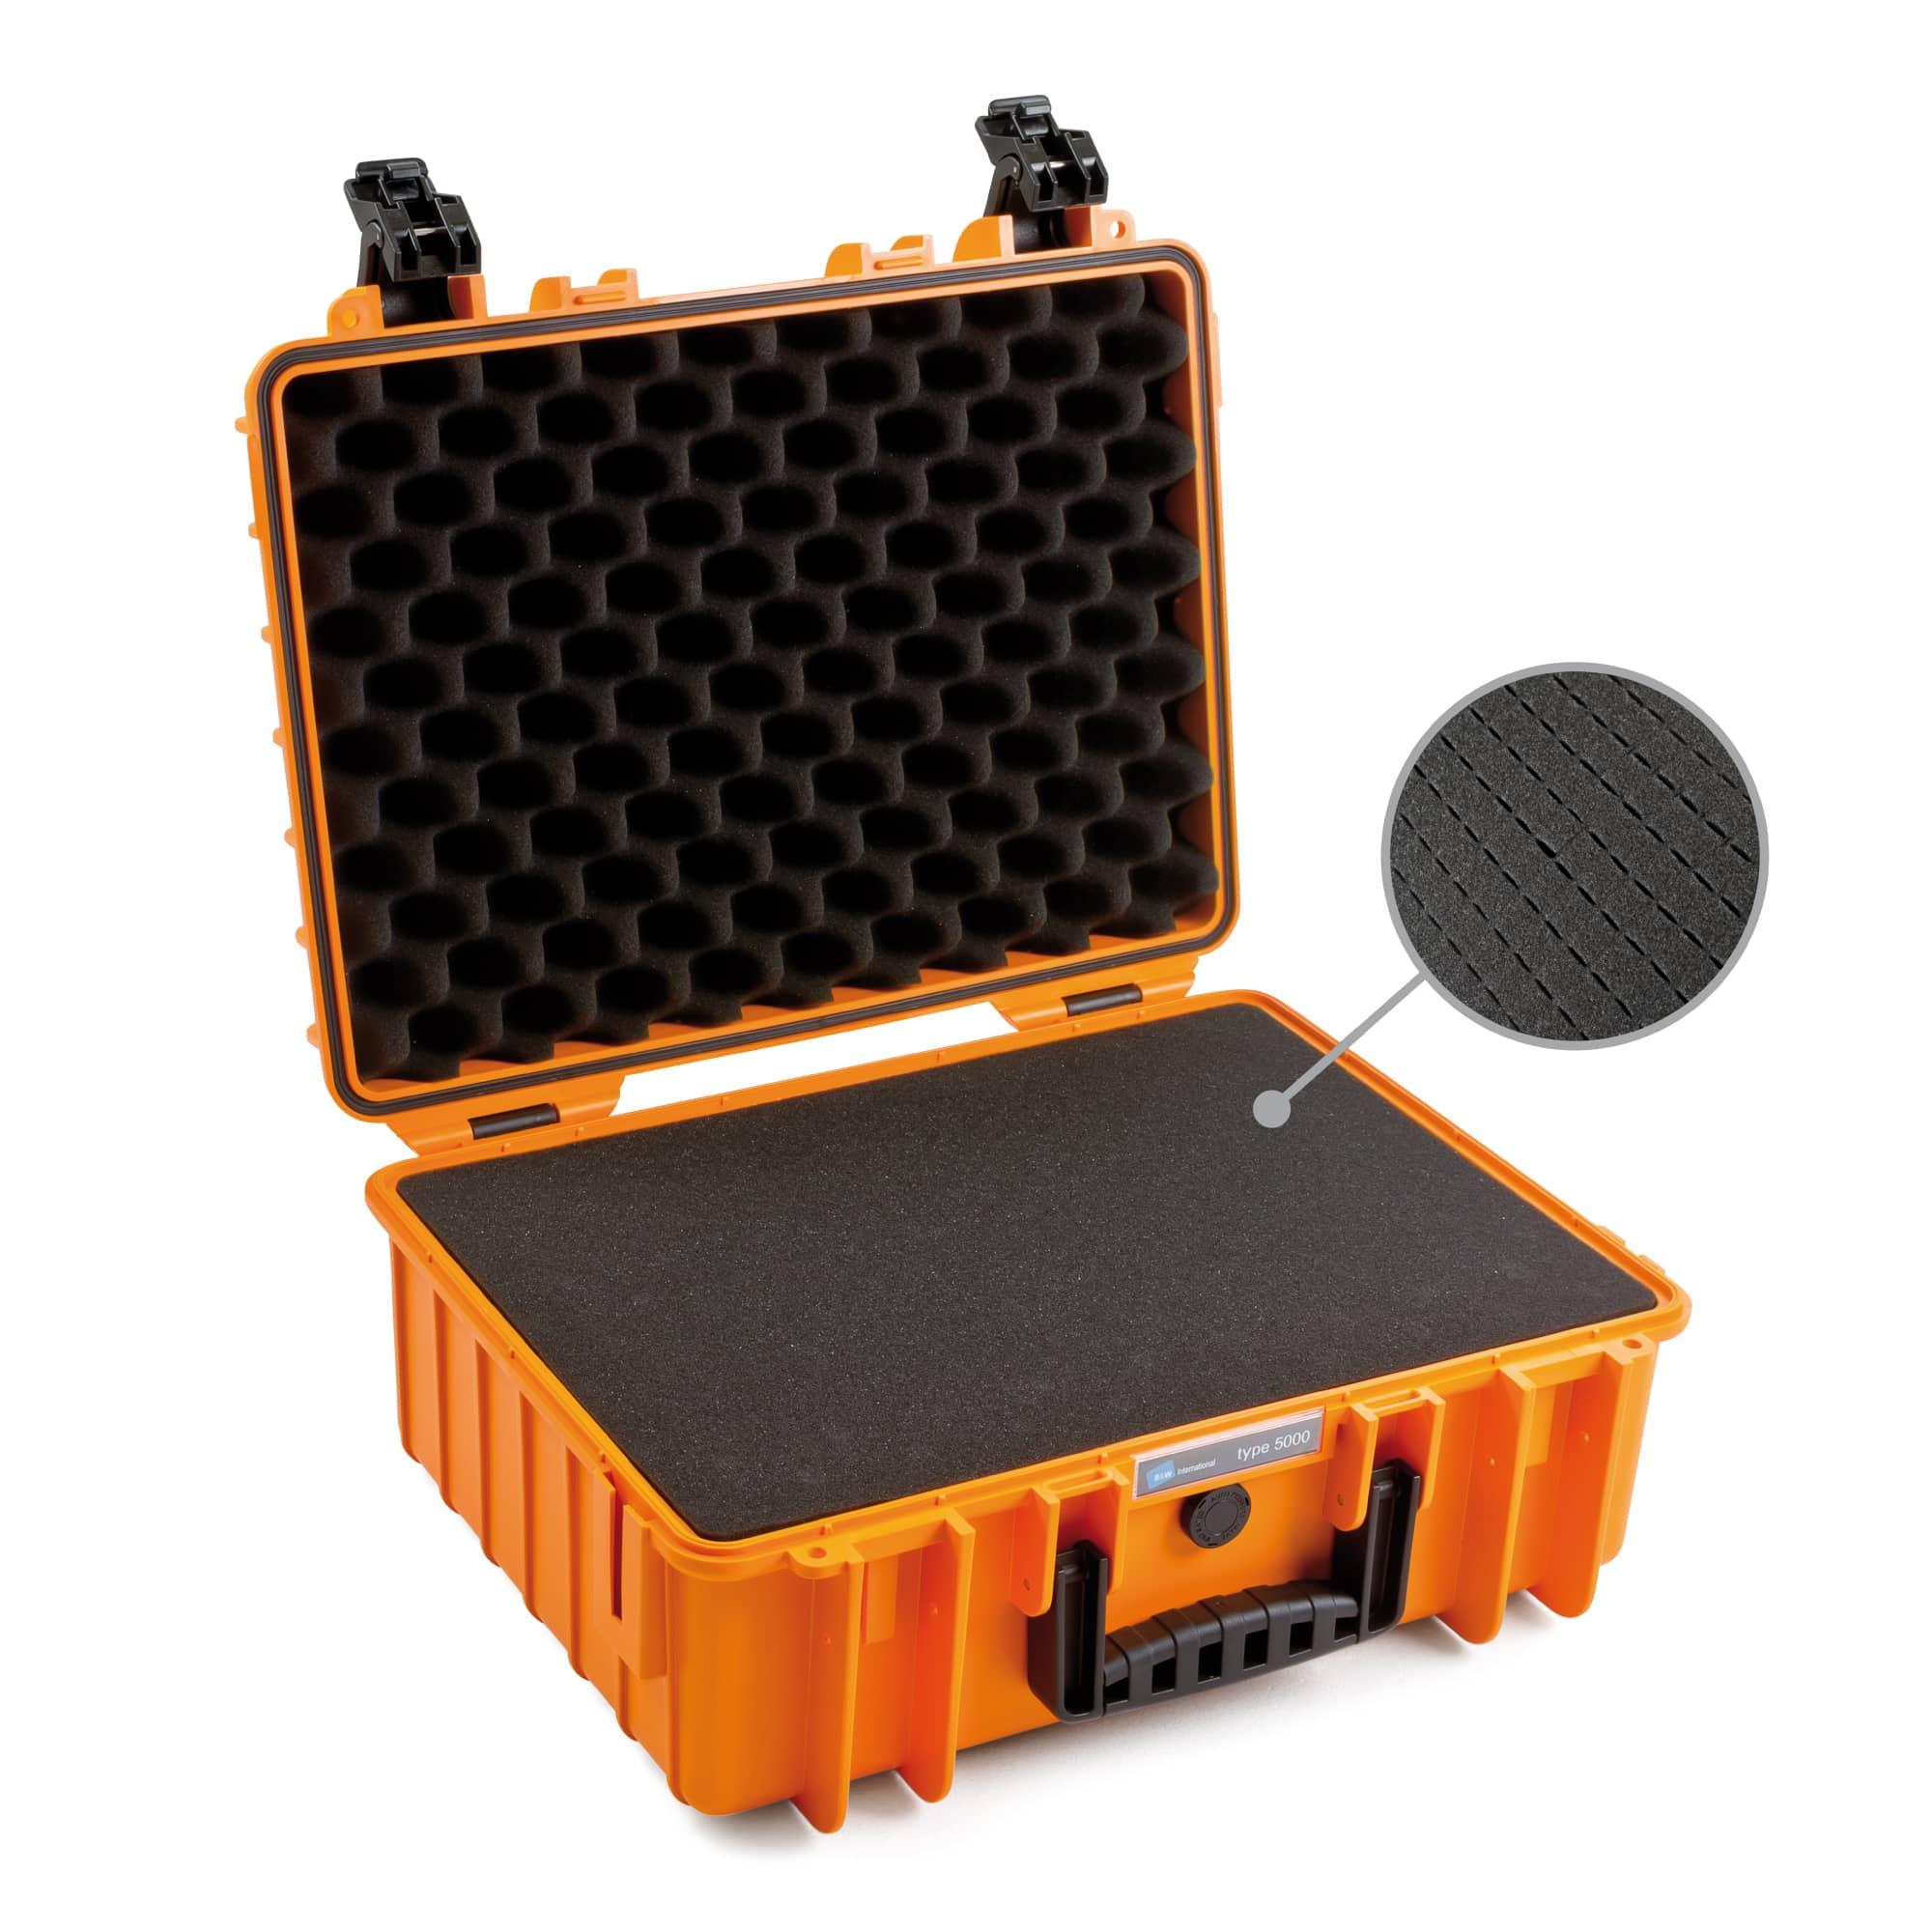 B&W Outdoor Case Typ 5000 orange with pre-cut foam( SI)